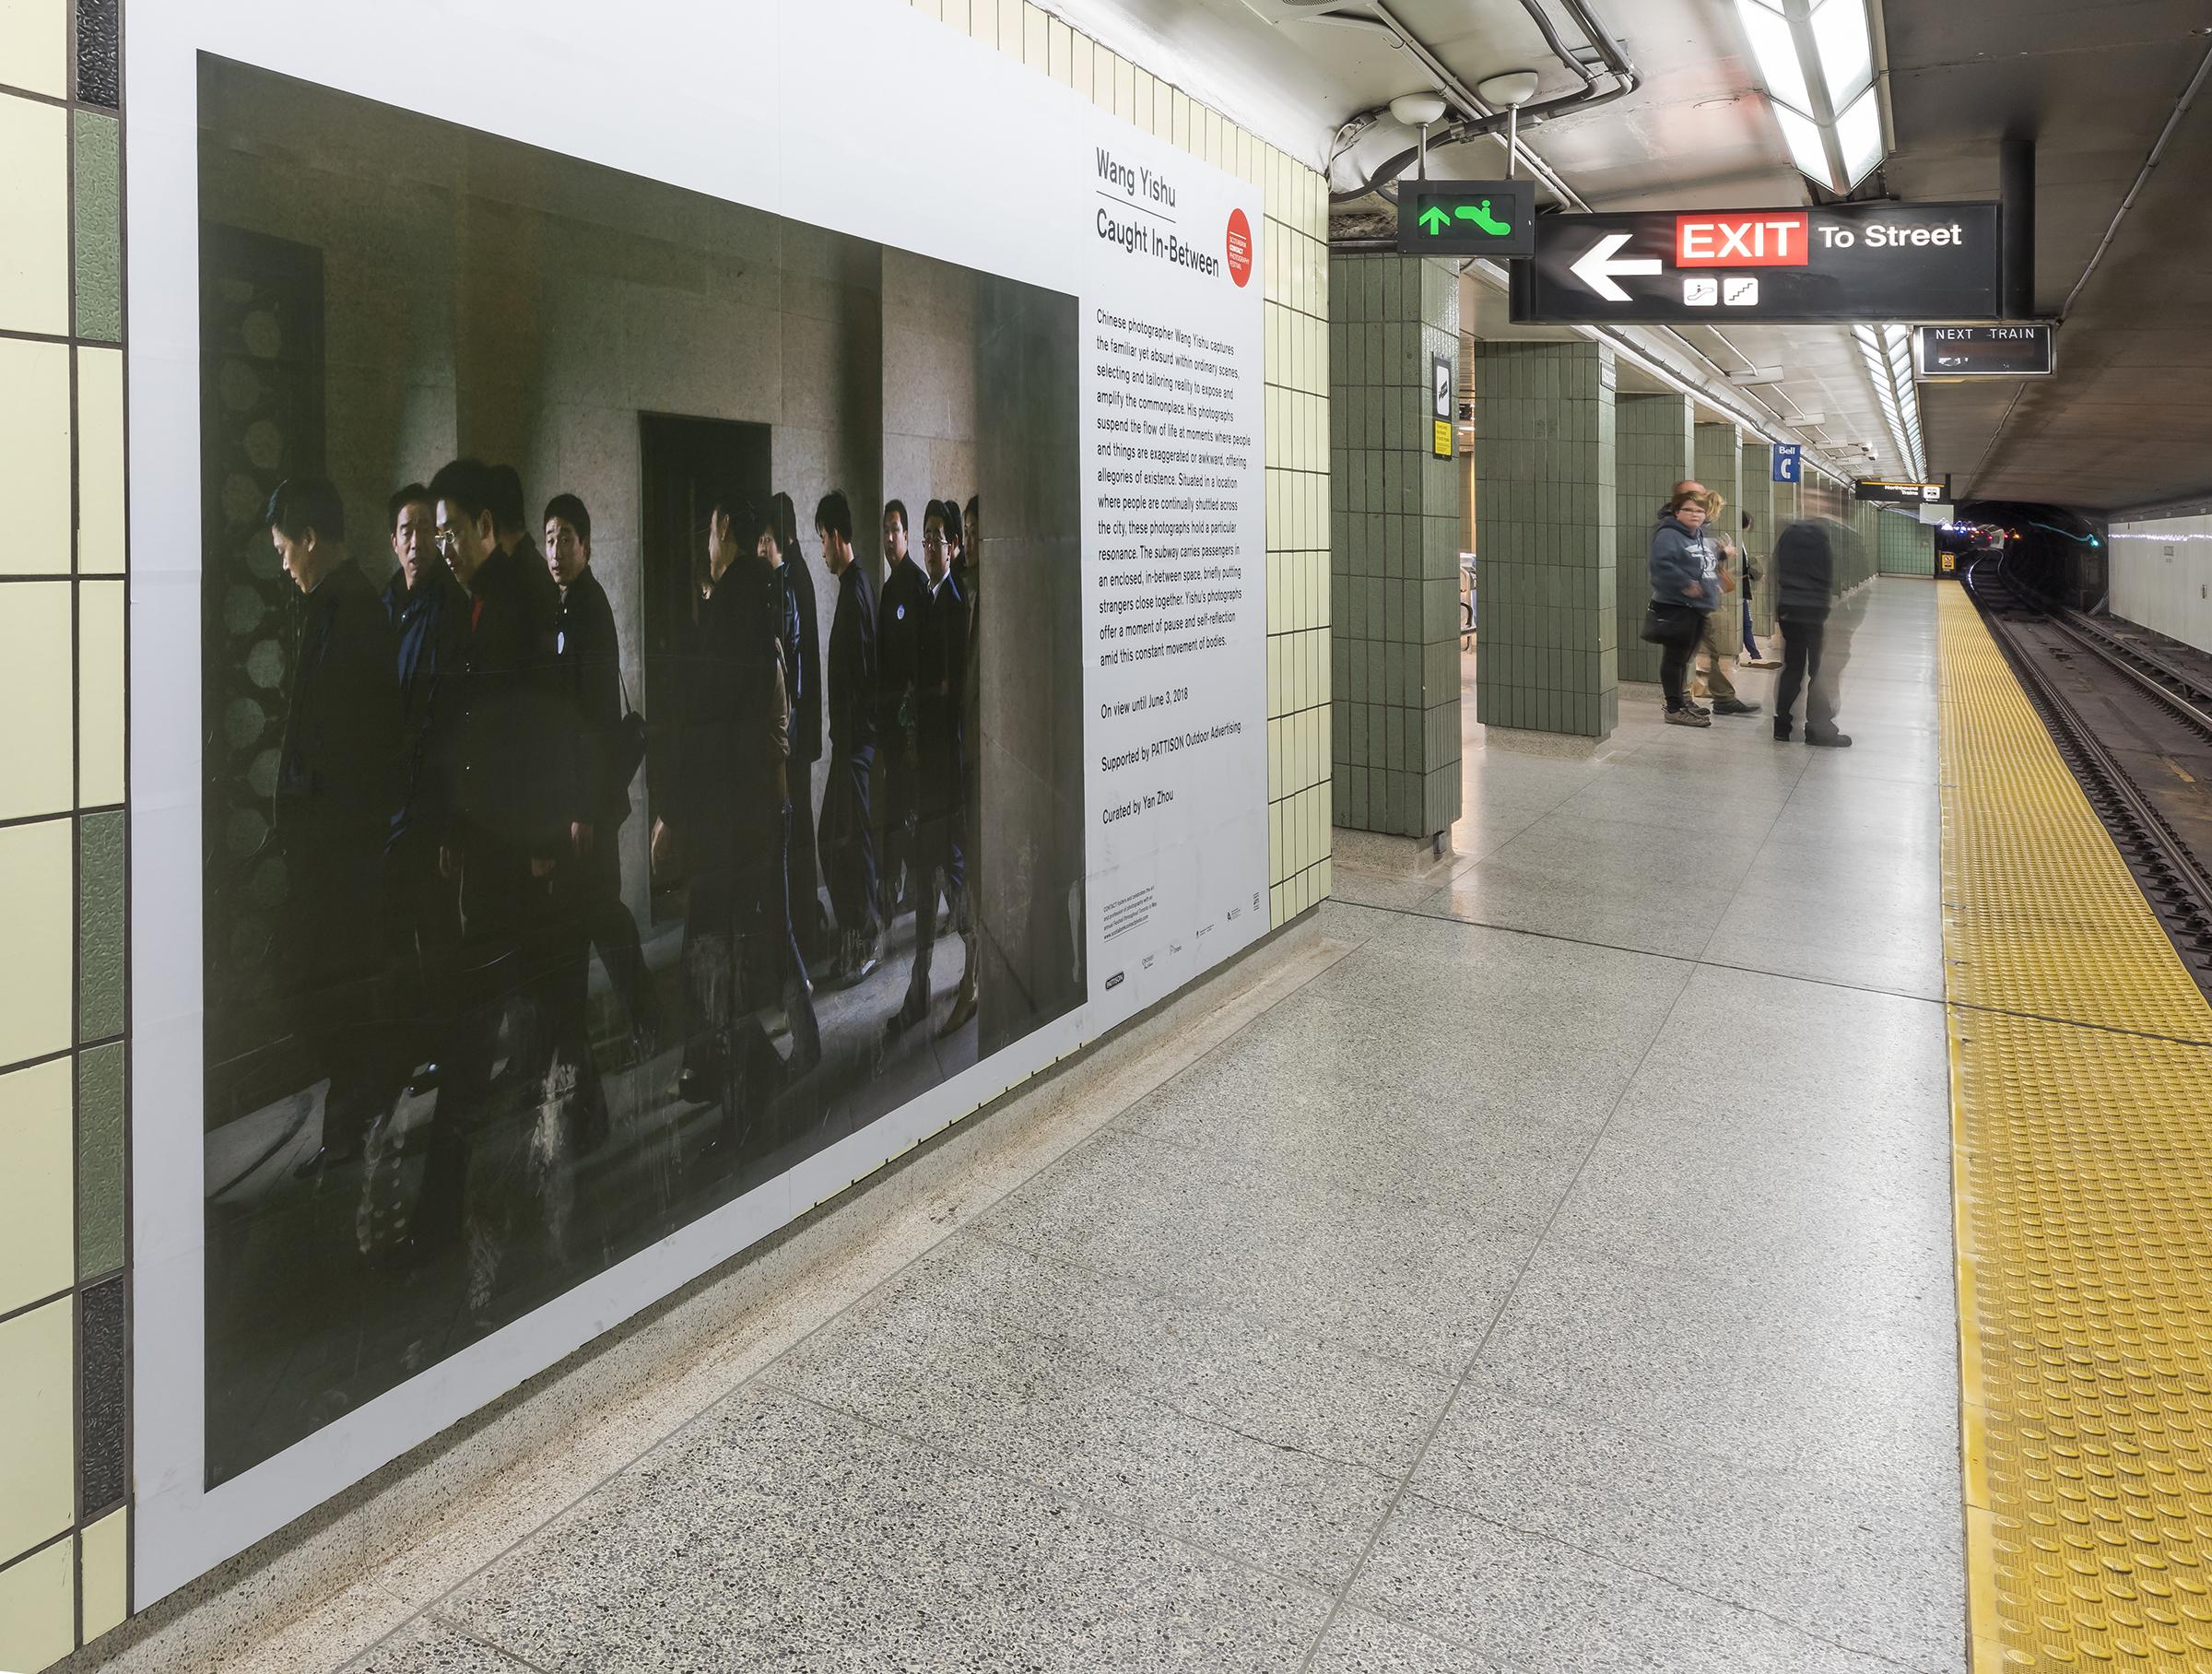 Wang Yishu, Caught In-Between, 2018. Installation at Osgoode Station, Toronto. Photo by Toni Hafkensheid